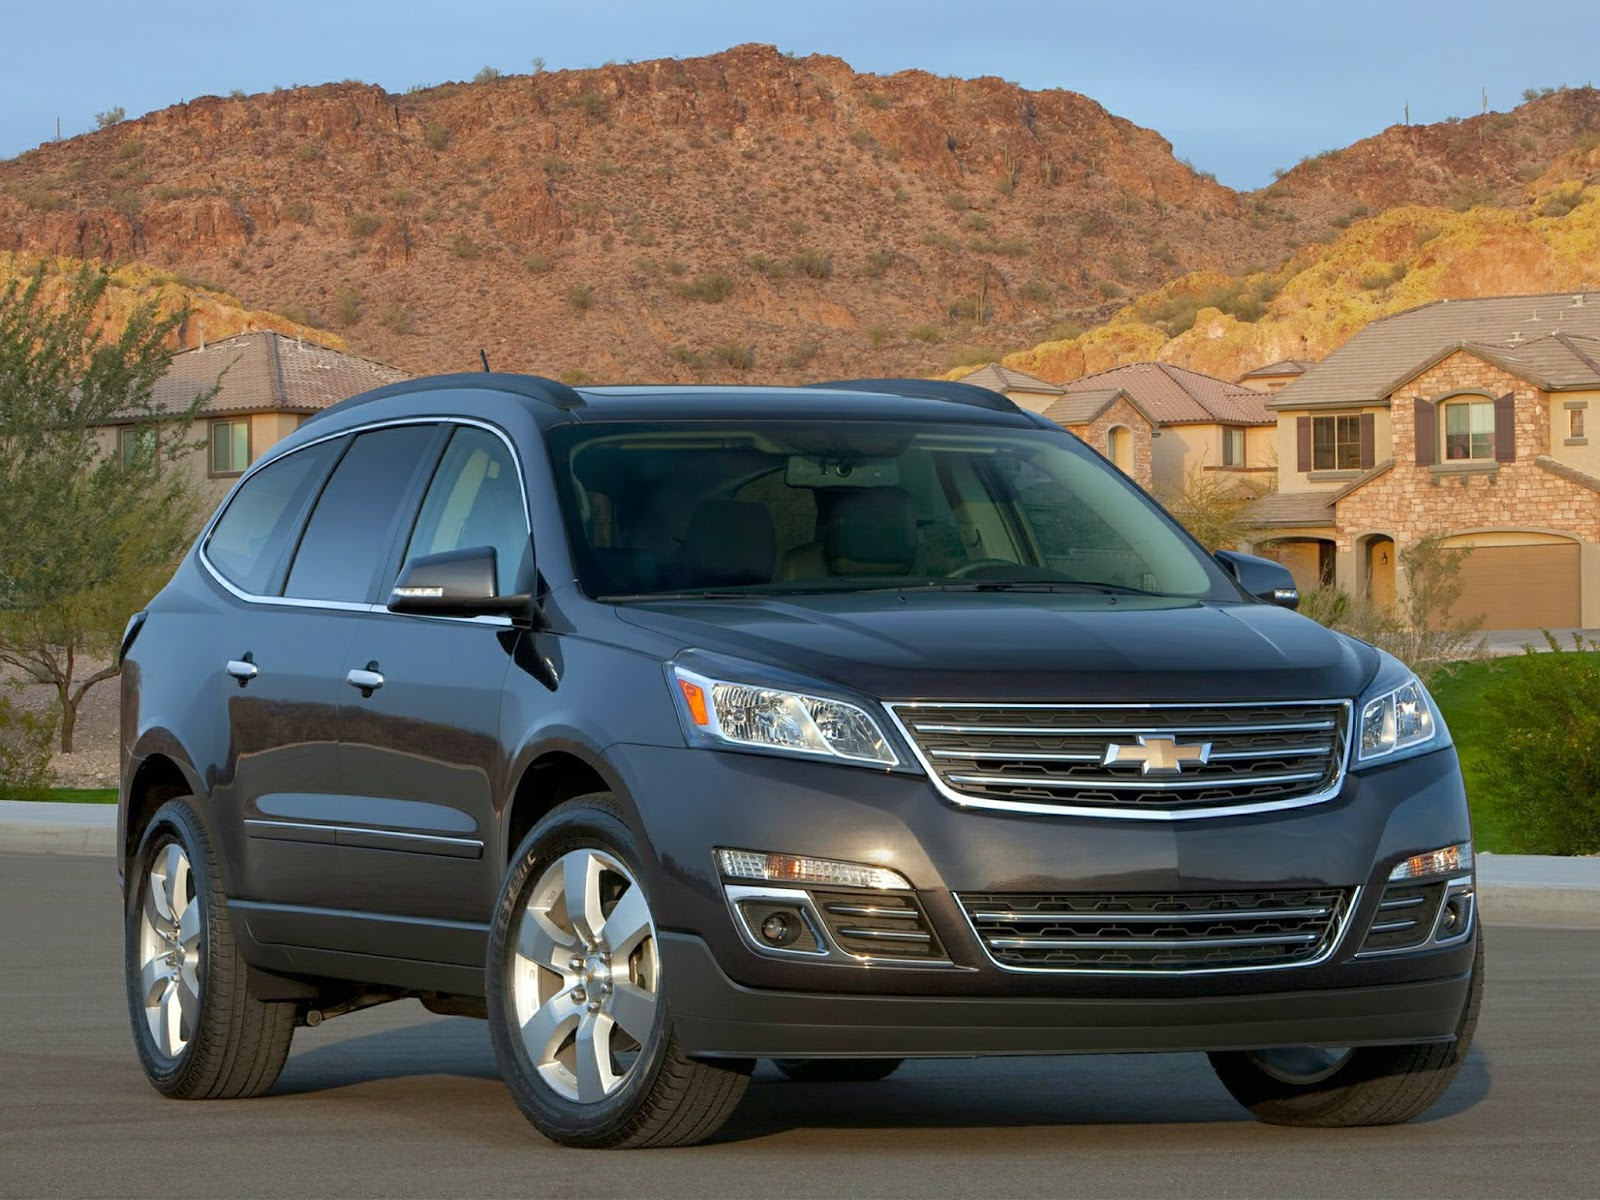 Chevrolet Traverse Makes 10 Best Family Cars List